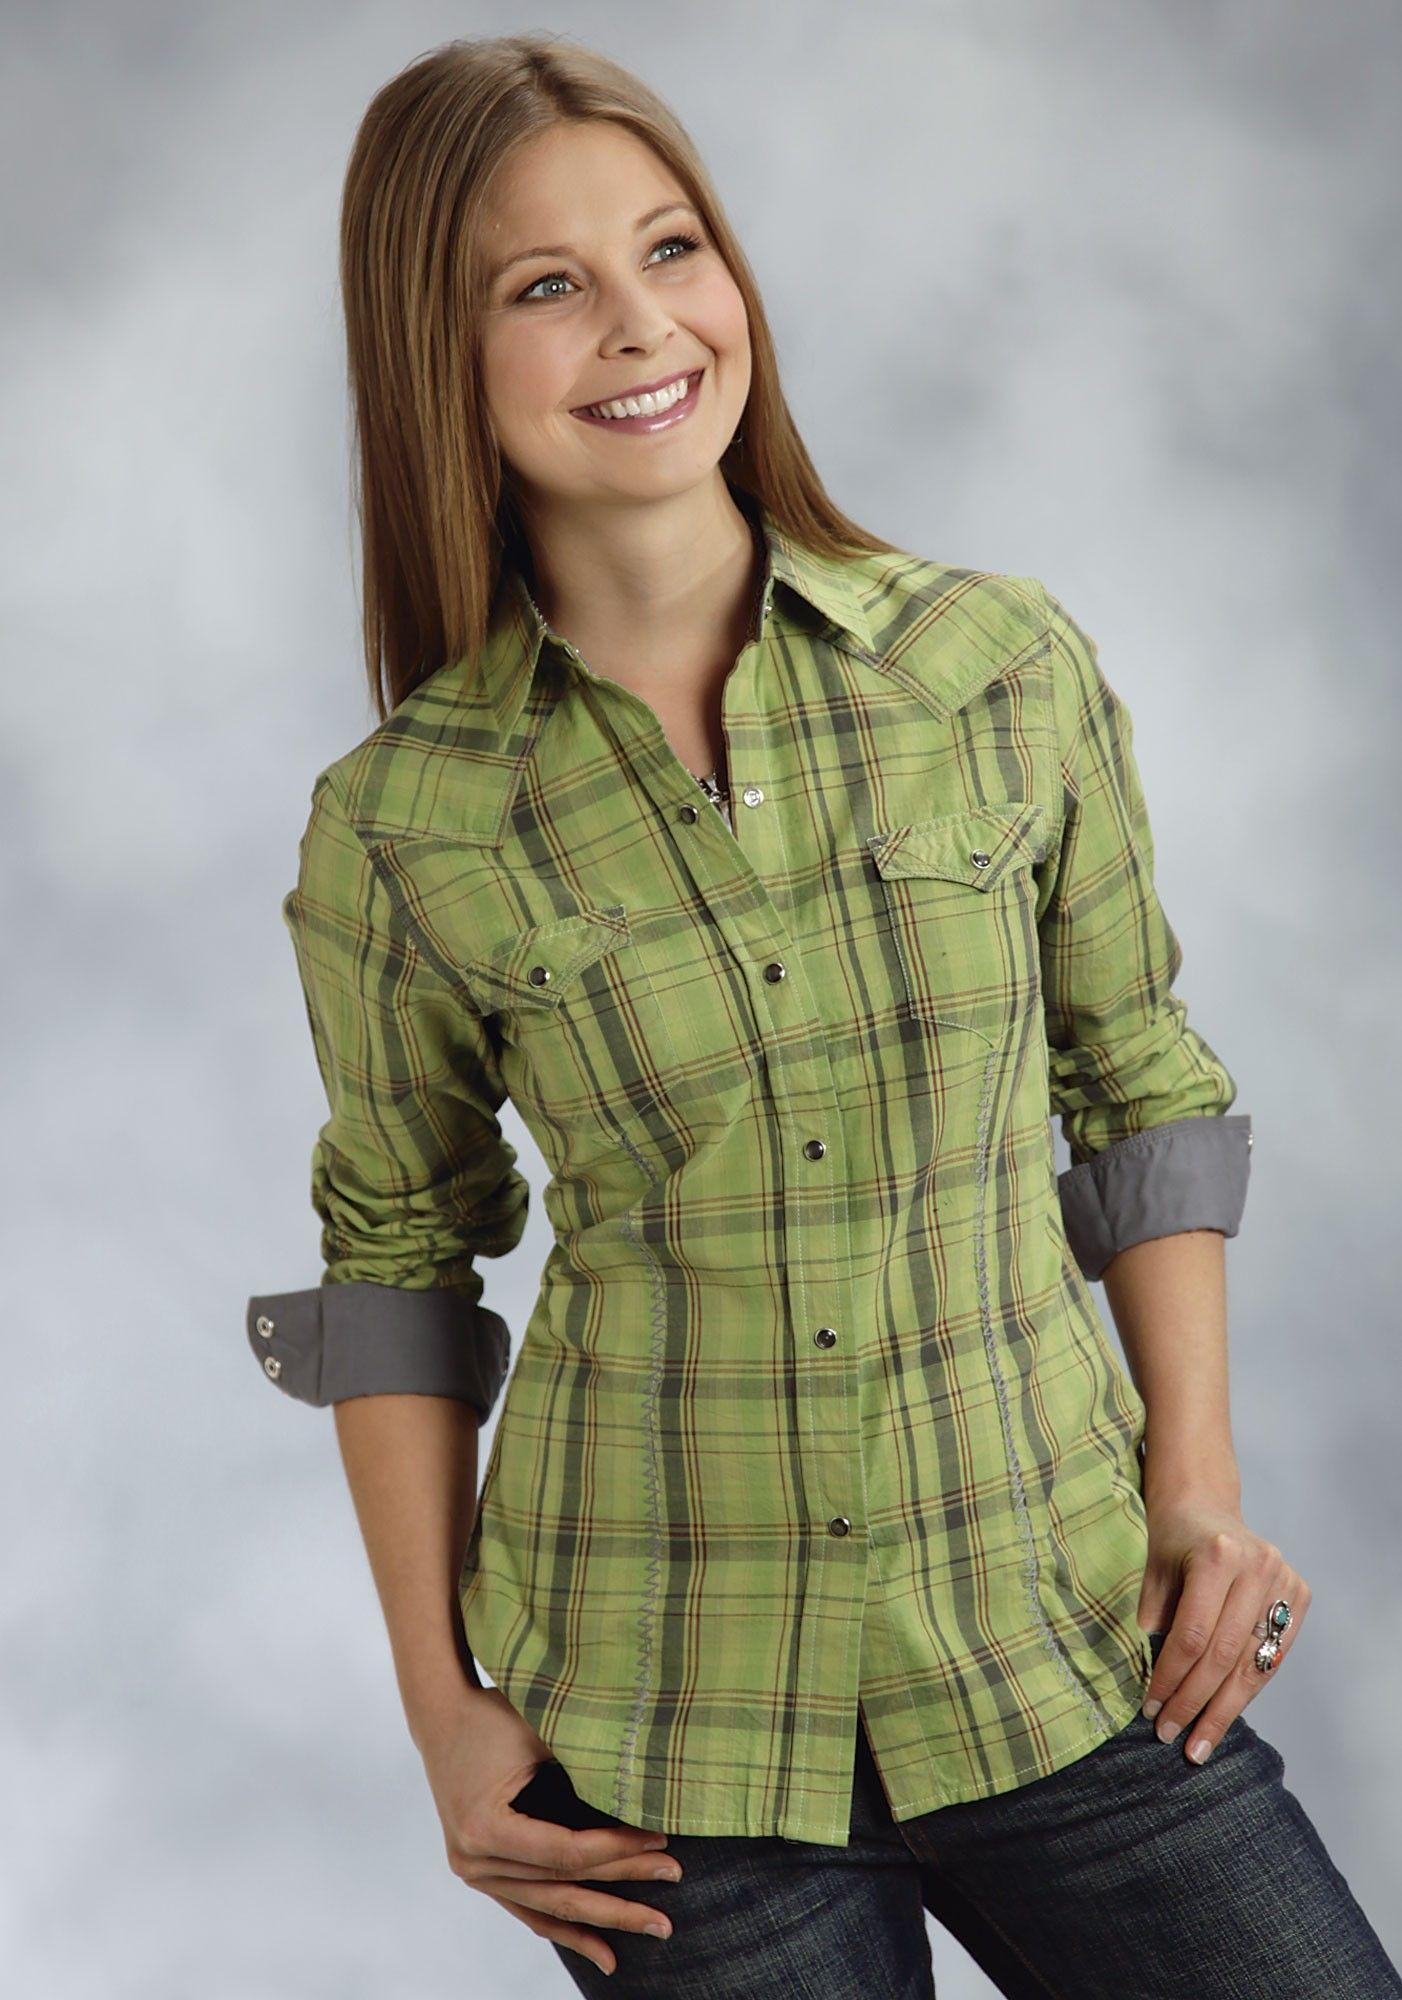 Snap Green Plaid Ladies Western Shirt ~ Split Pea ~ AJ's Western Wear - Snap Green Plaid Ladies Western Shirt ~ Split Pea ~ AJ's Western